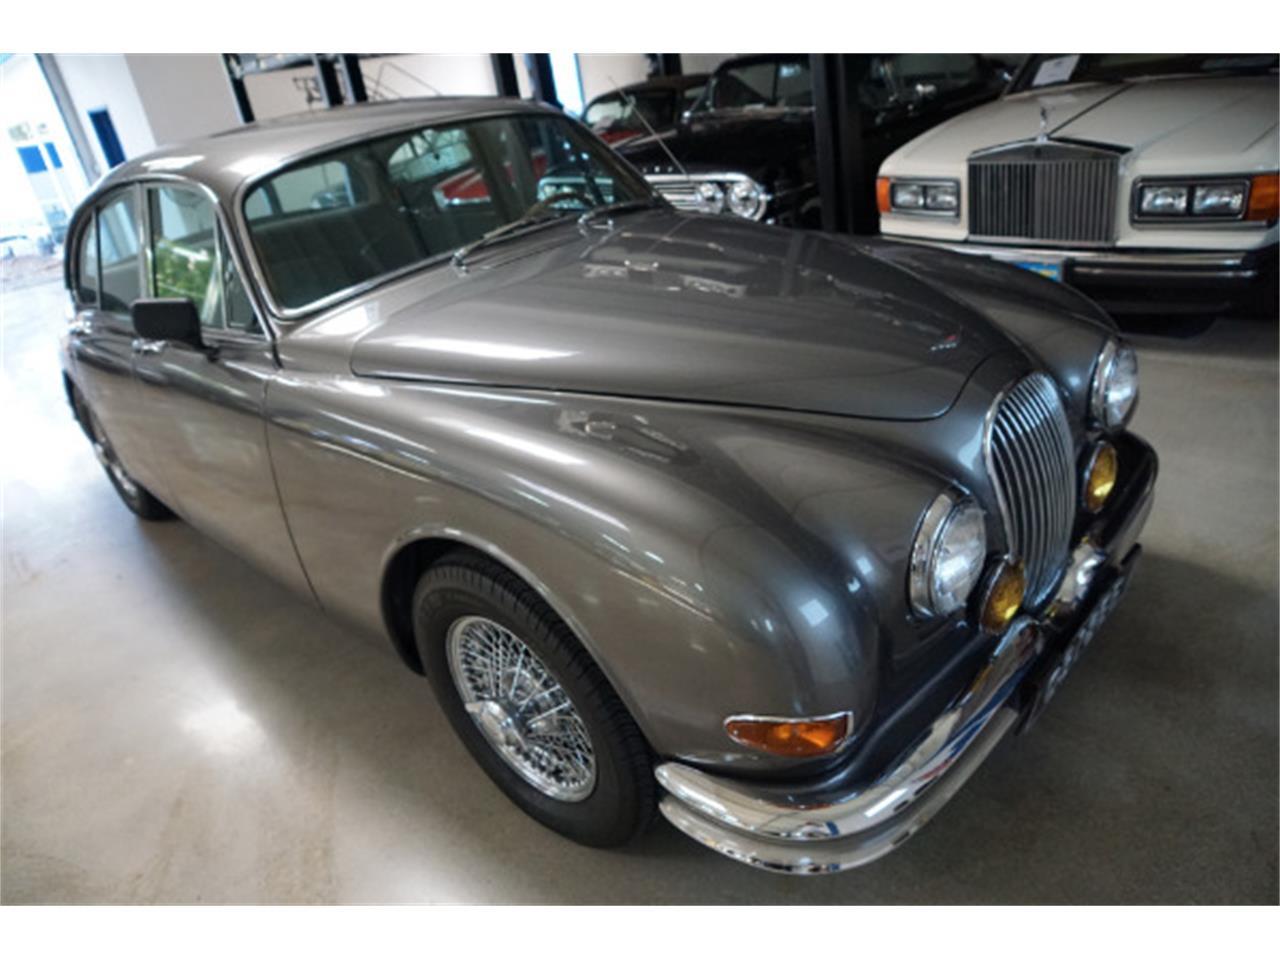 1967 Jaguar Mark II for Sale | ClassicCars.com | CC-1019032